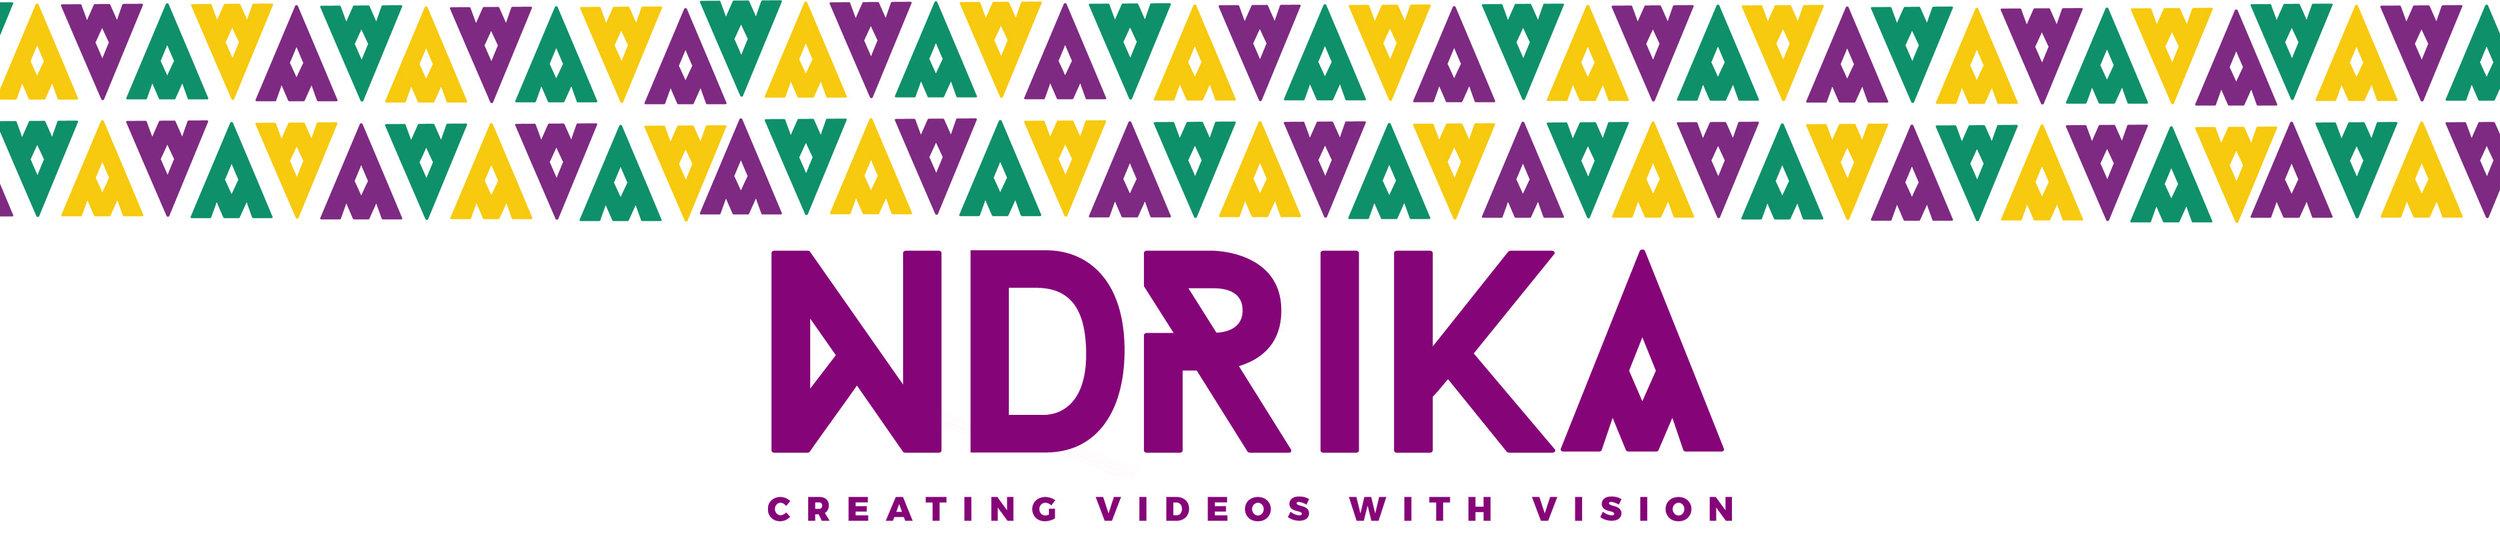 Ndrika doc banner.jpg